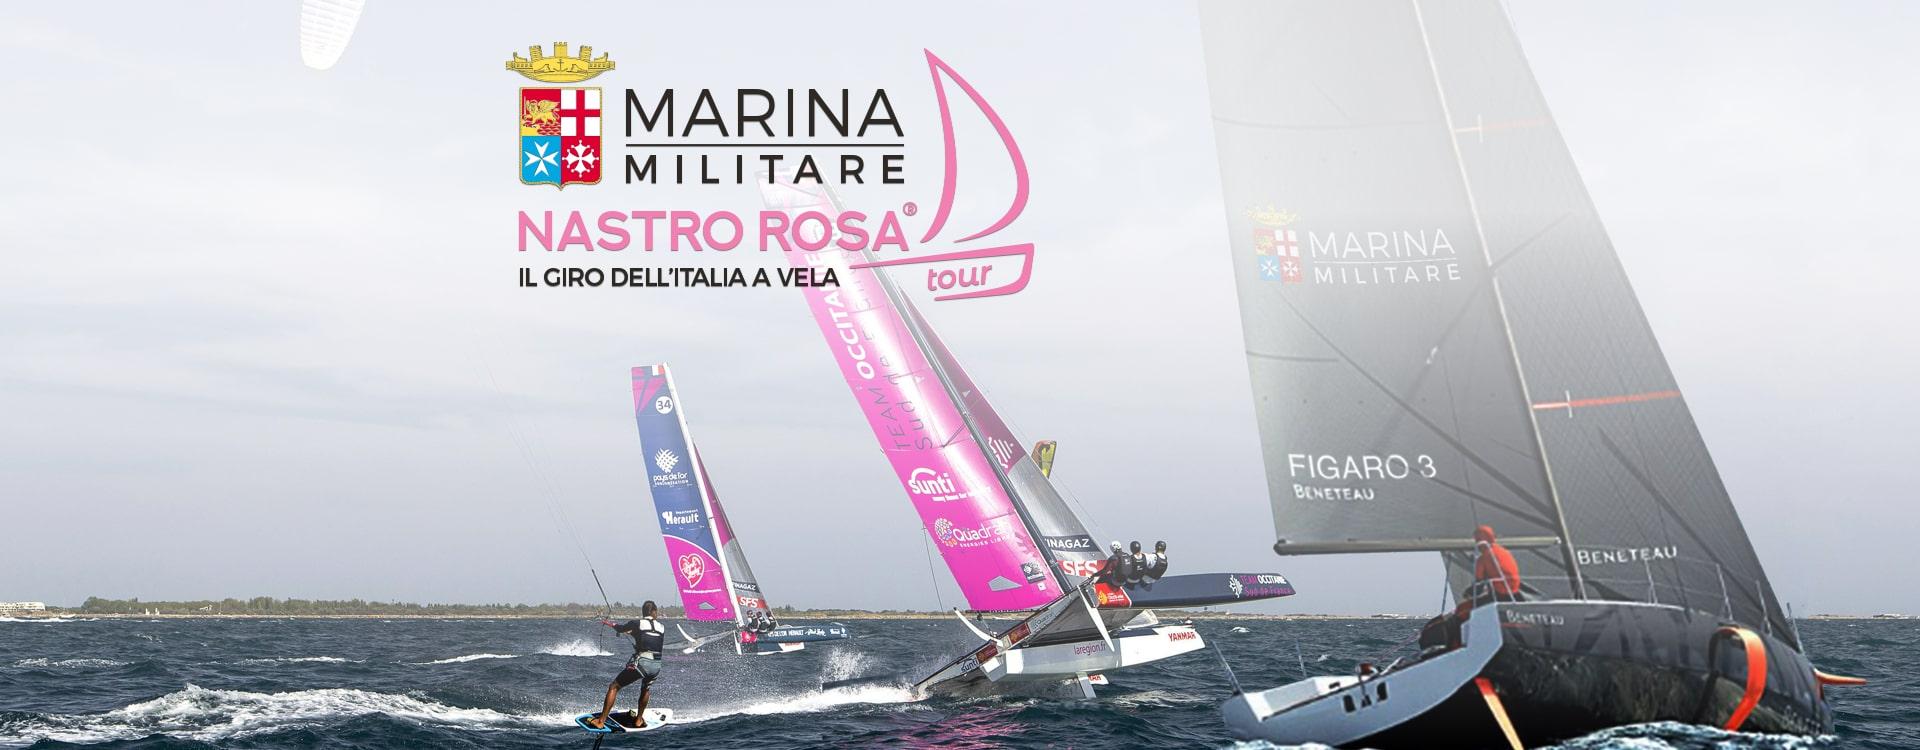 Marina Militare Nastro Rosa Tour